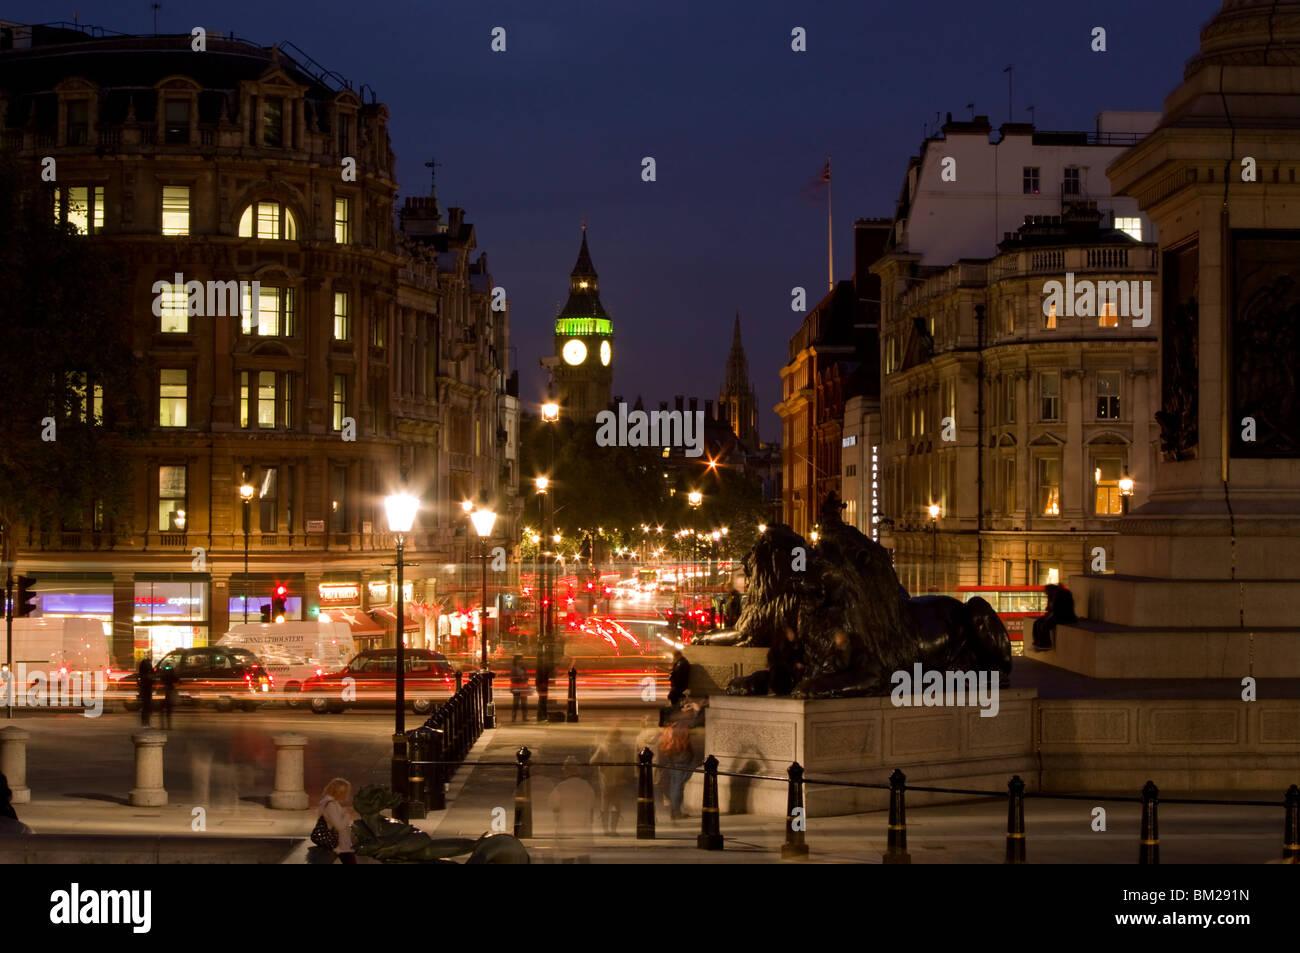 Big Ben and Whitehall from Trafalgar Square, London, UK - Stock Image